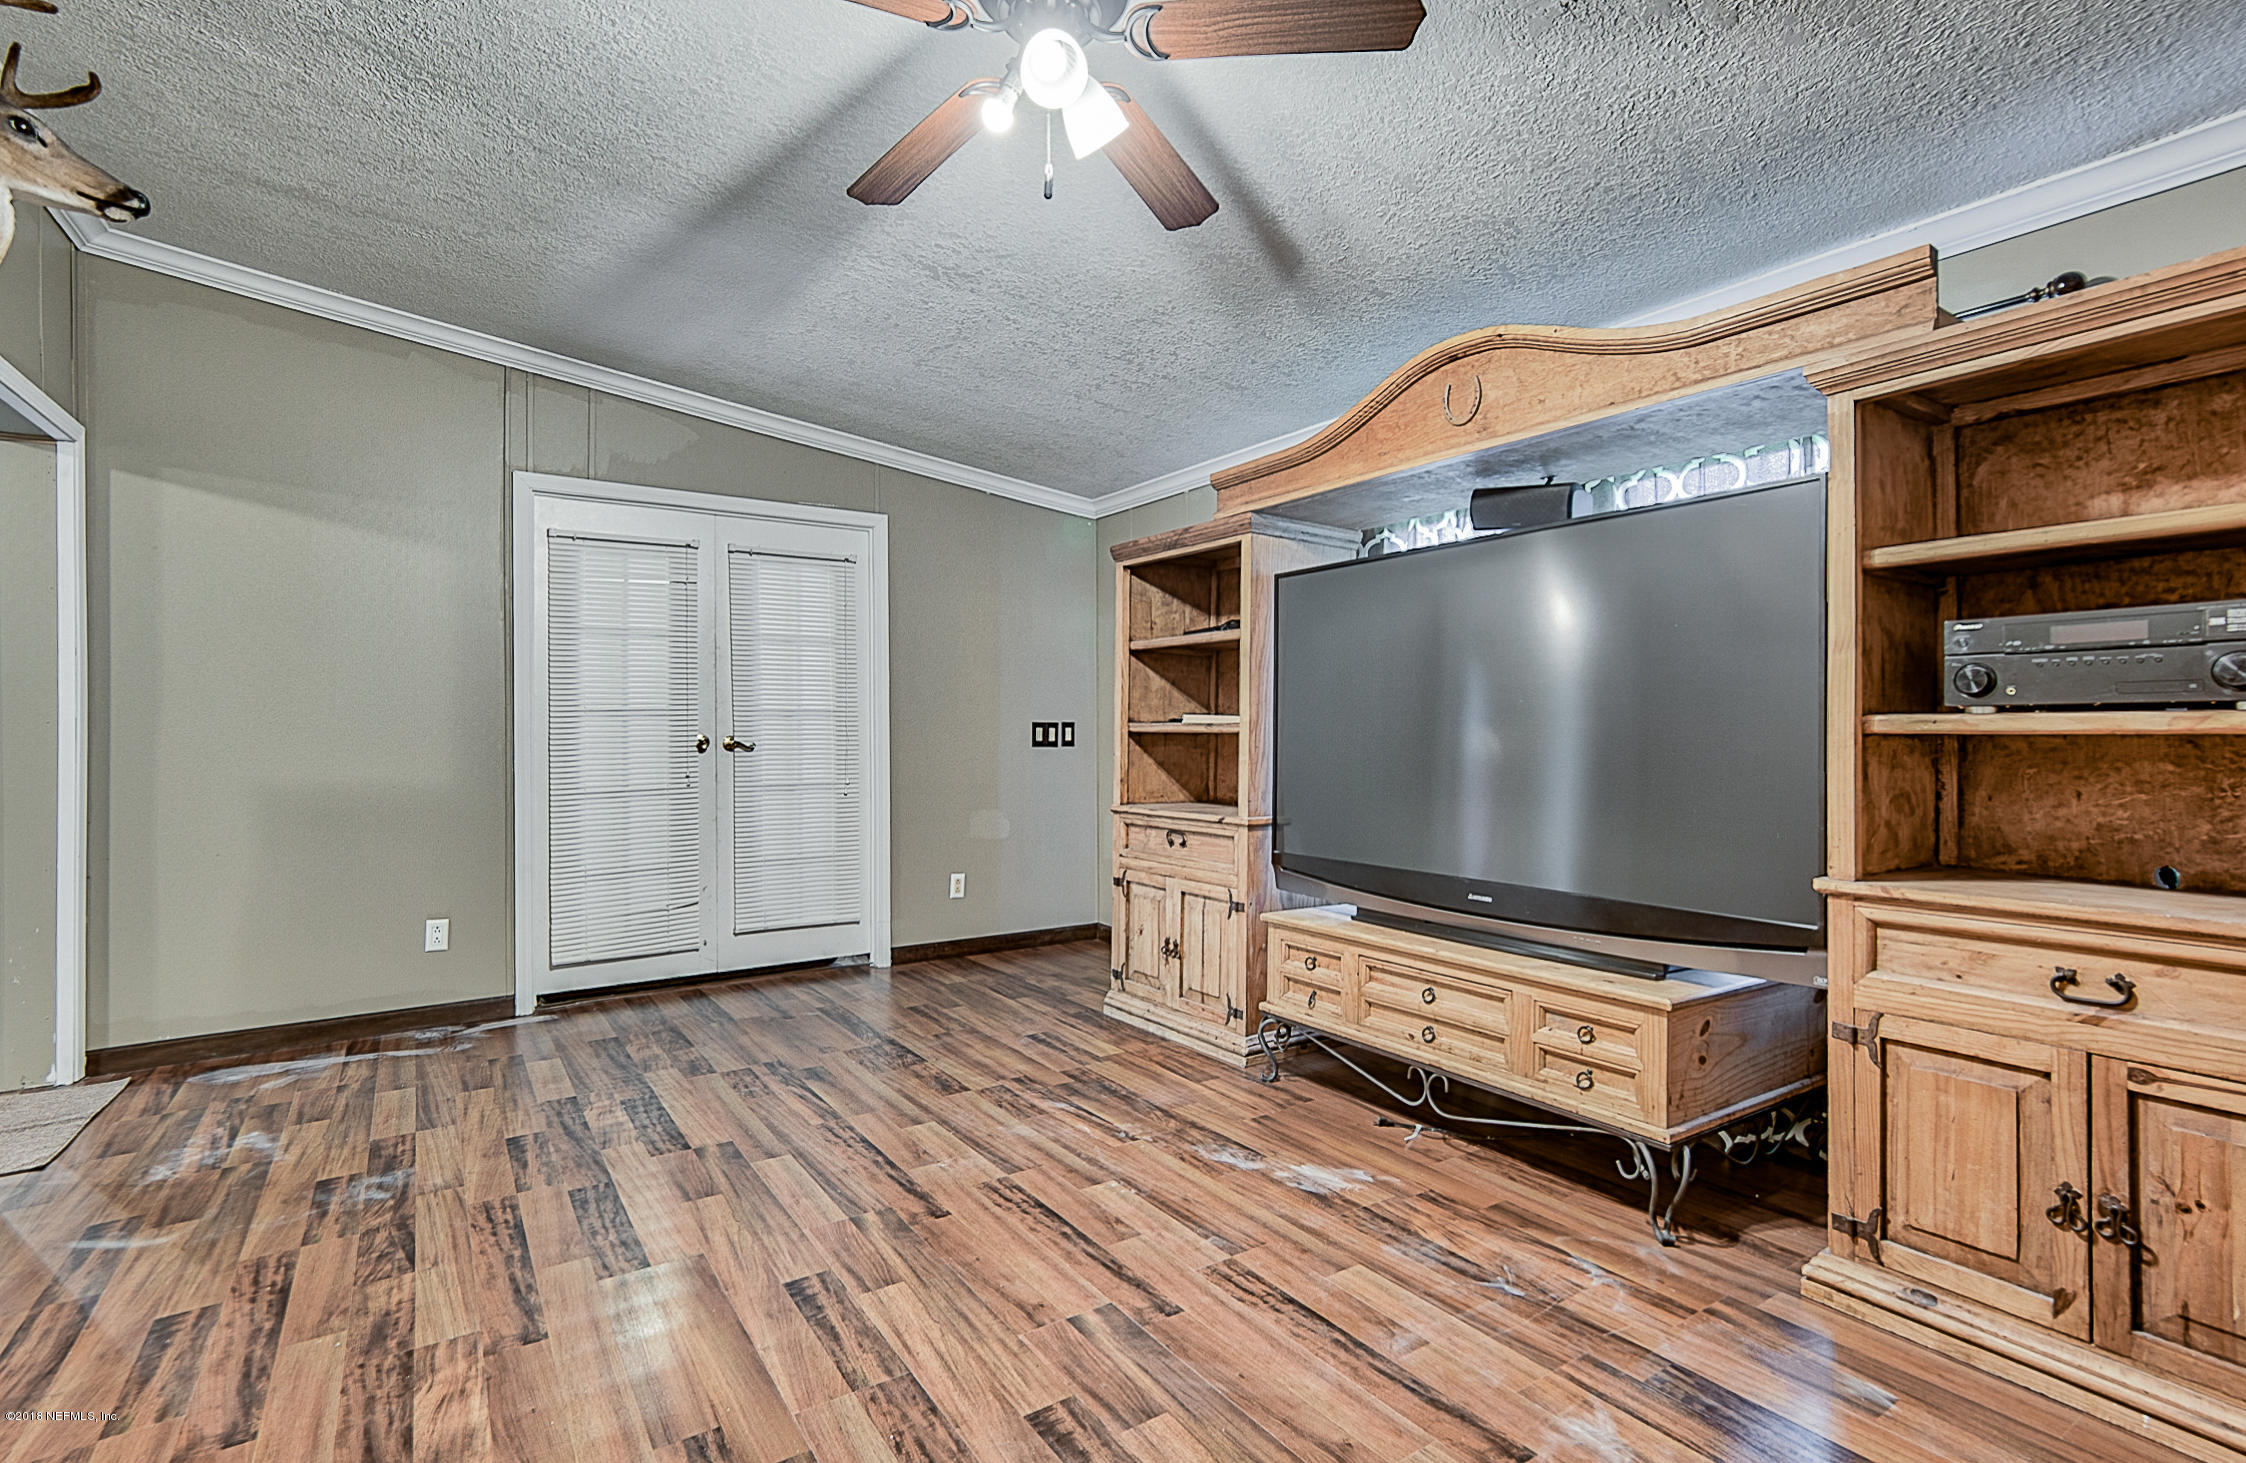 10433 OAKWOOD, GLEN ST. MARY, FLORIDA 32040, 3 Bedrooms Bedrooms, ,2 BathroomsBathrooms,Residential - single family,For sale,OAKWOOD,953256